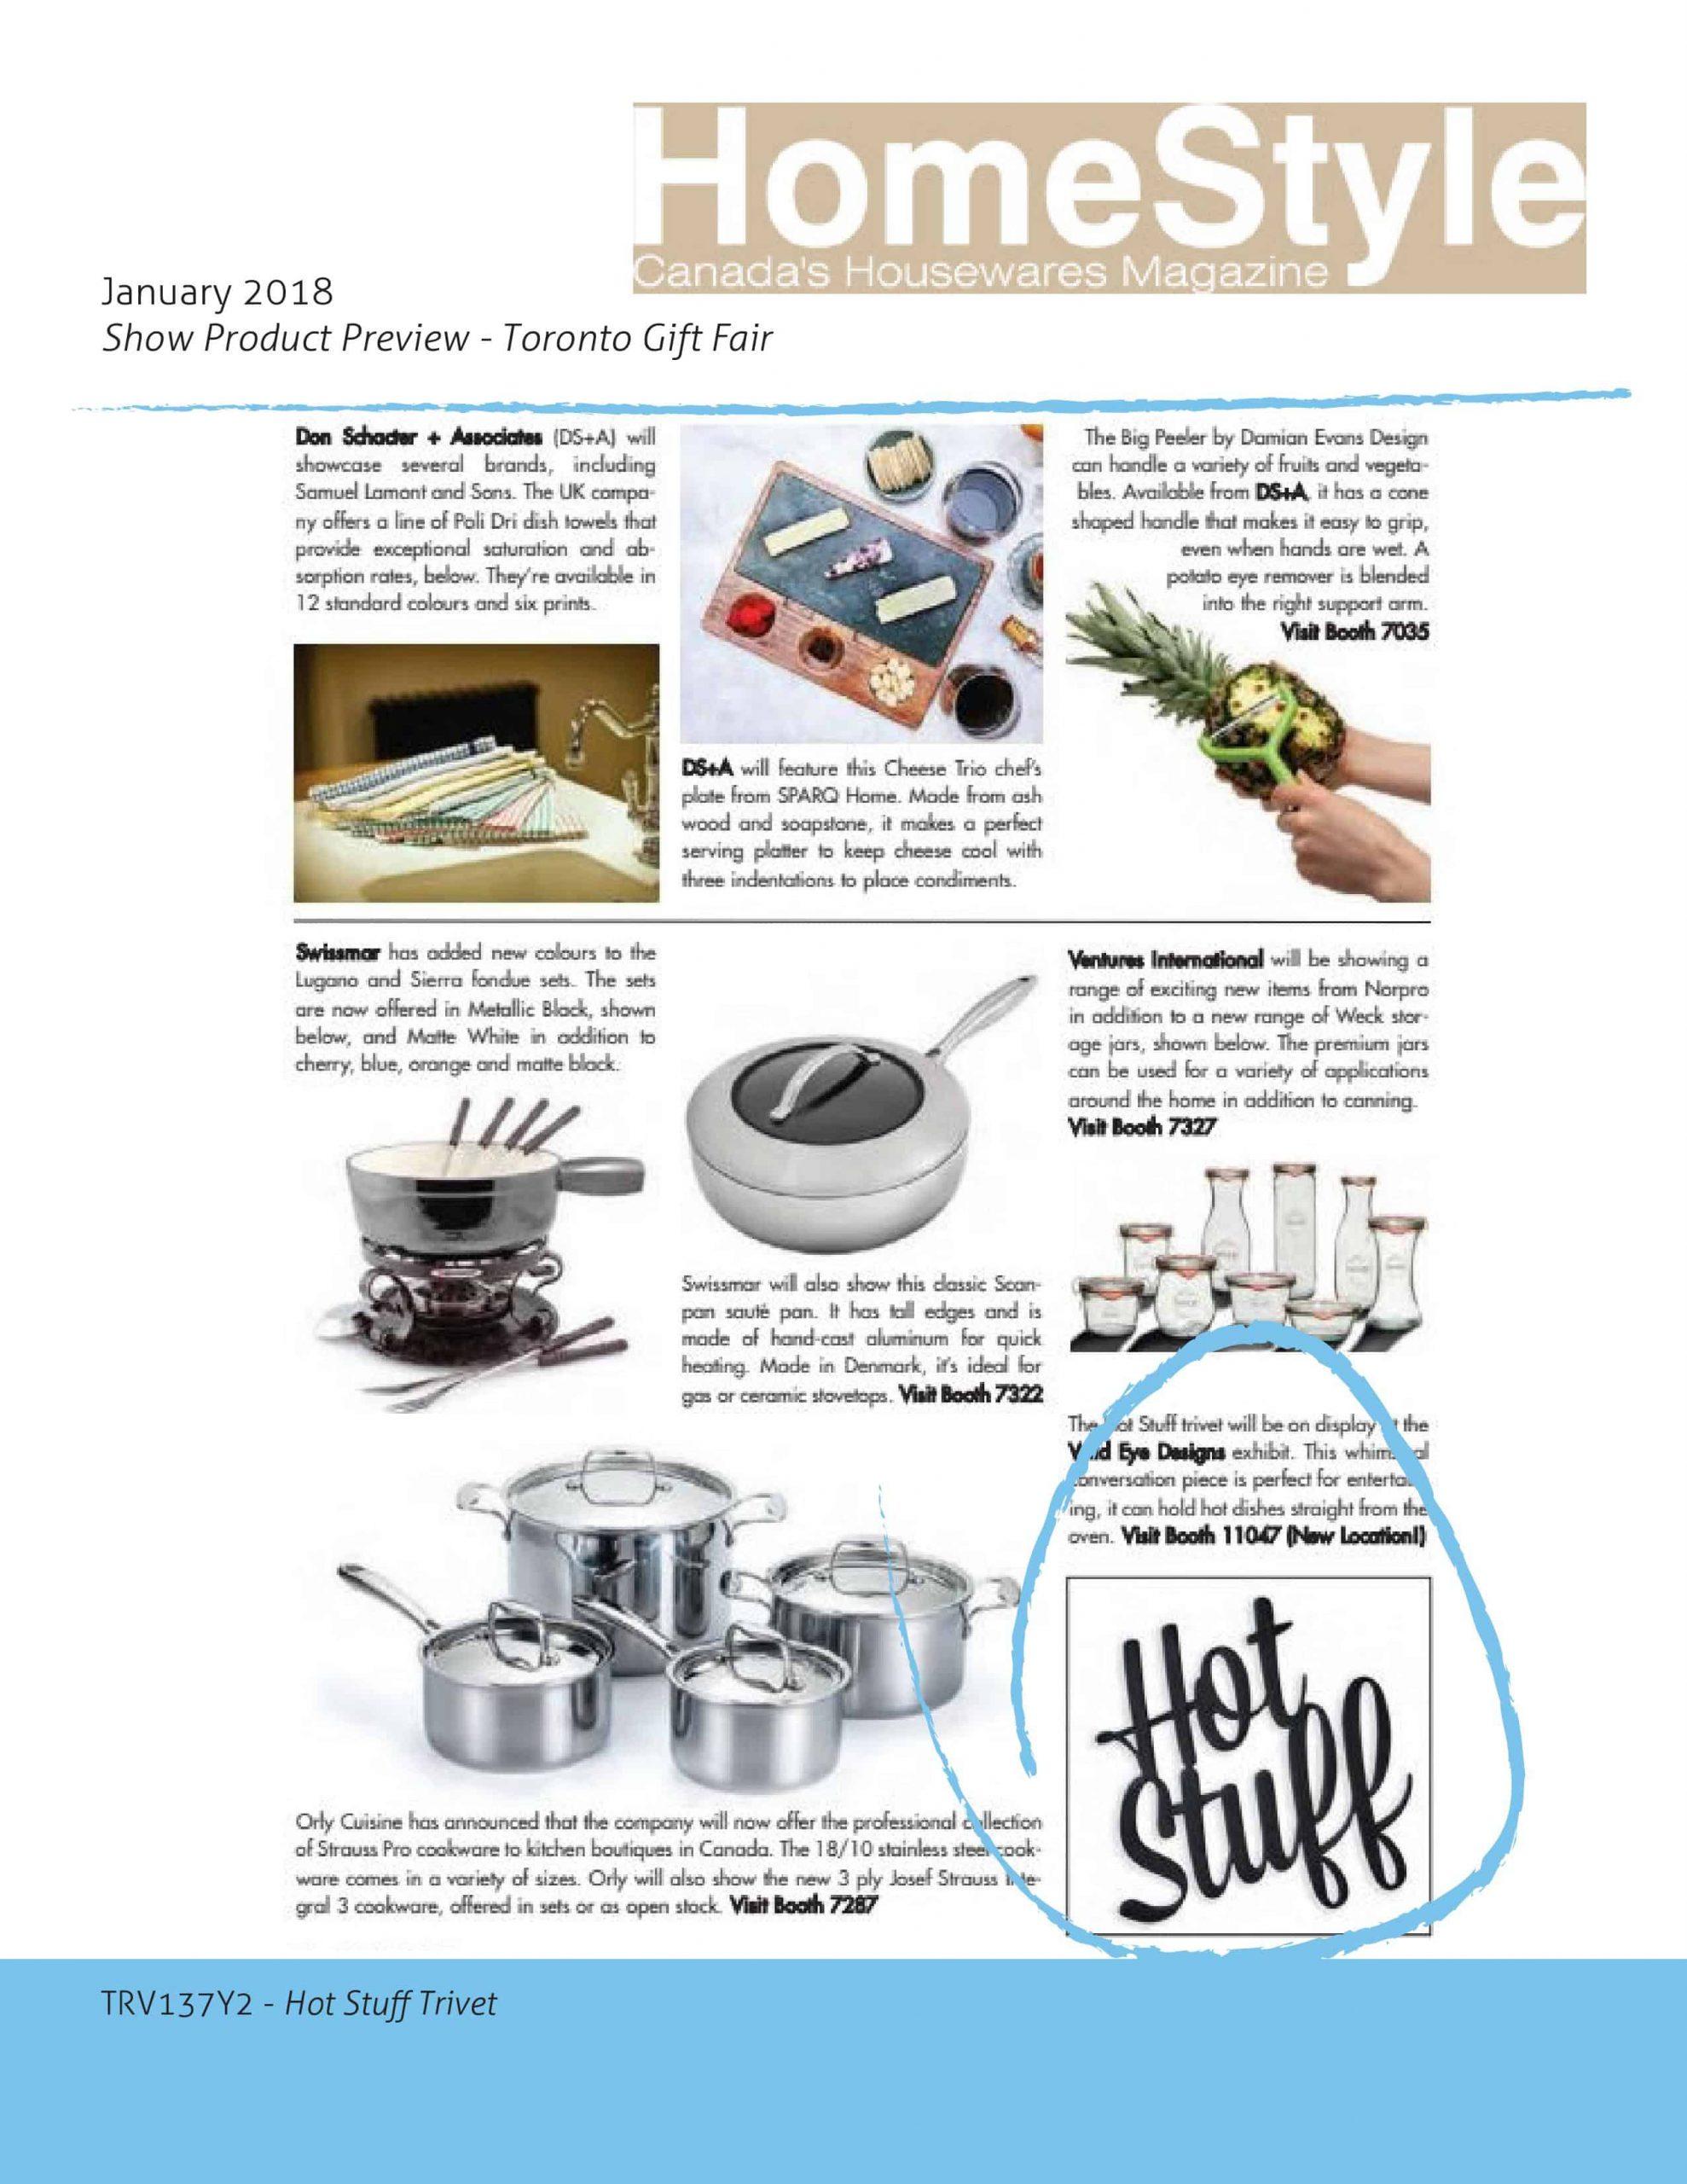 HomeStyle Canada's Housewares Magazine January 2018 Issue